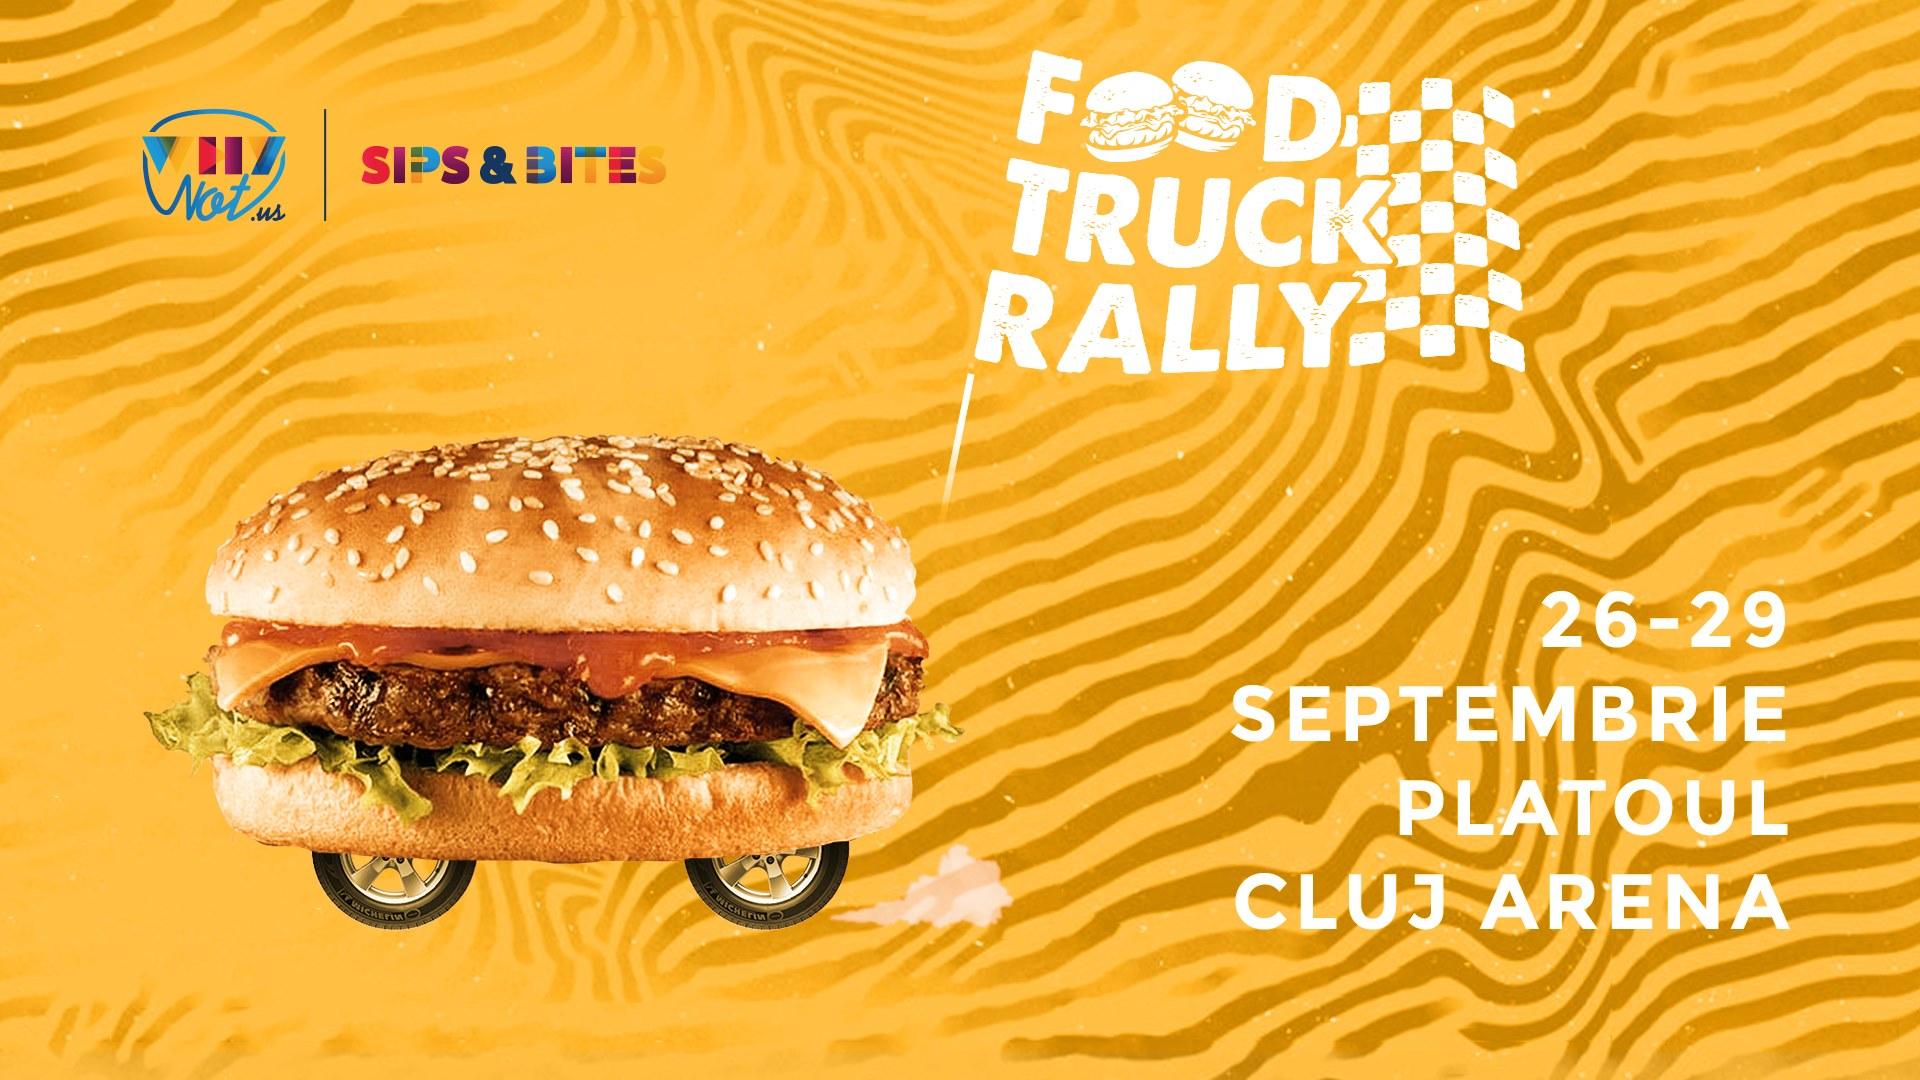 Food Truck Rally 2019